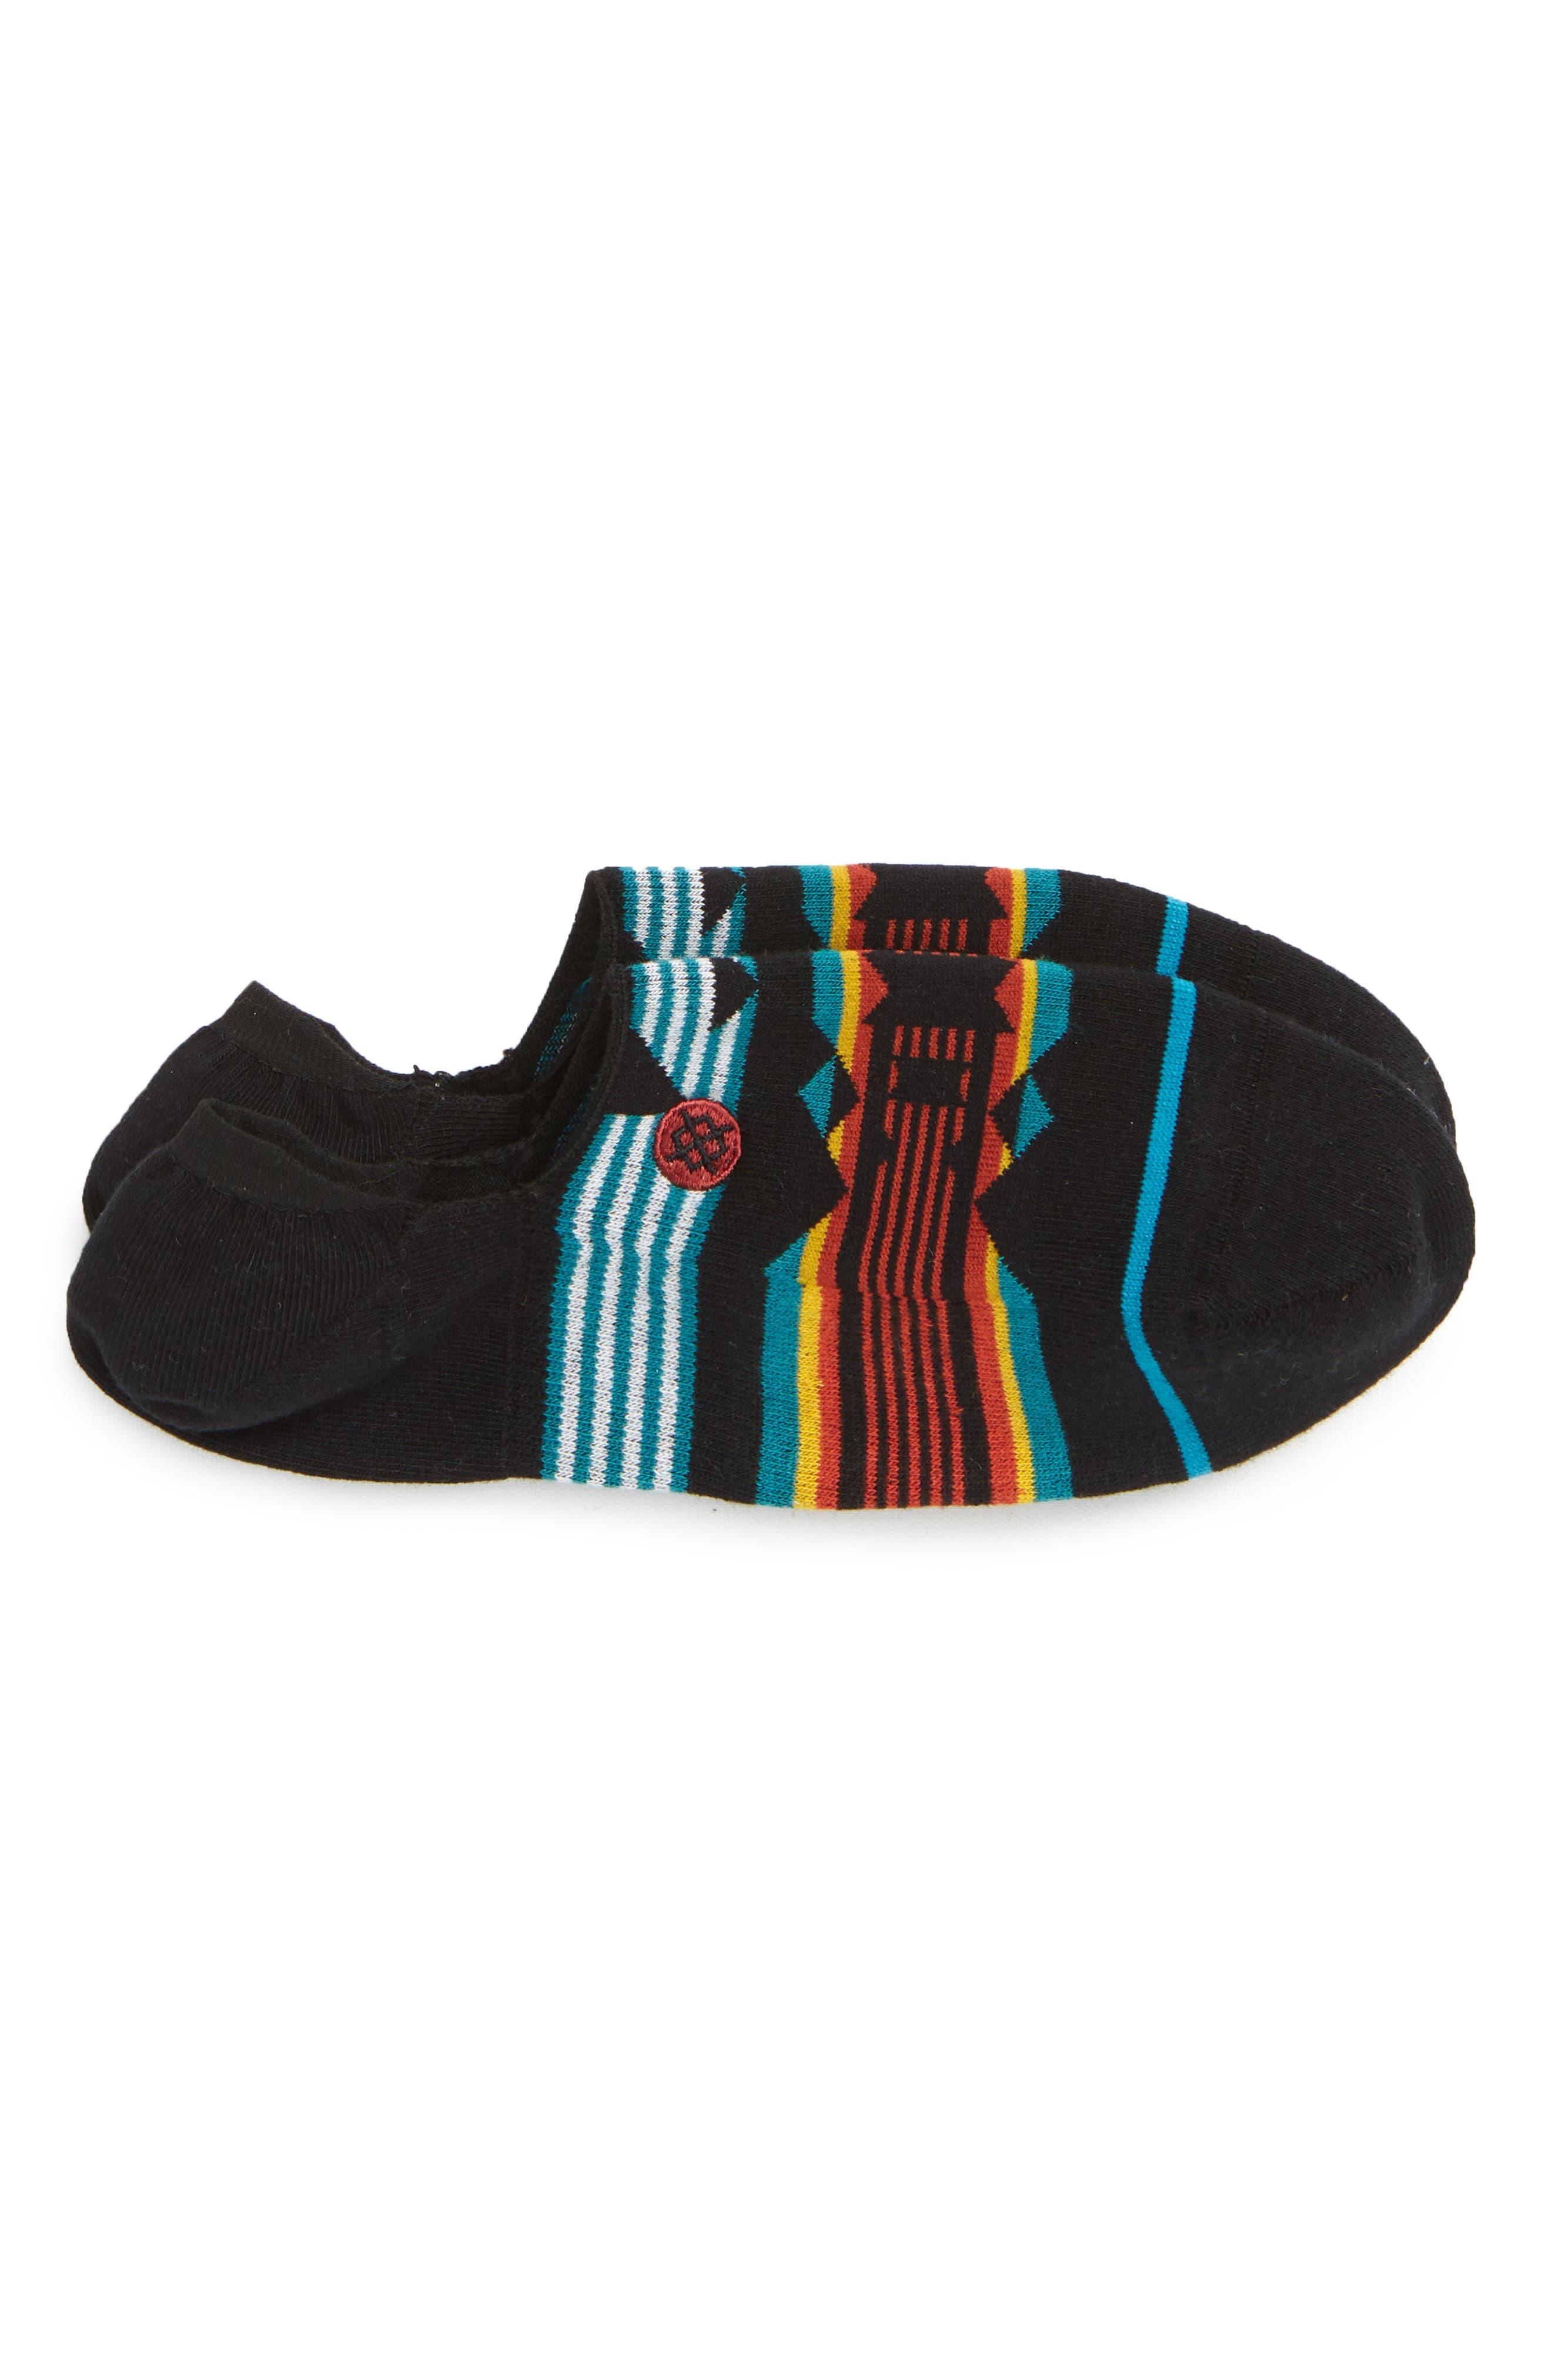 Cedergren Low Socks,                             Main thumbnail 1, color,                             001